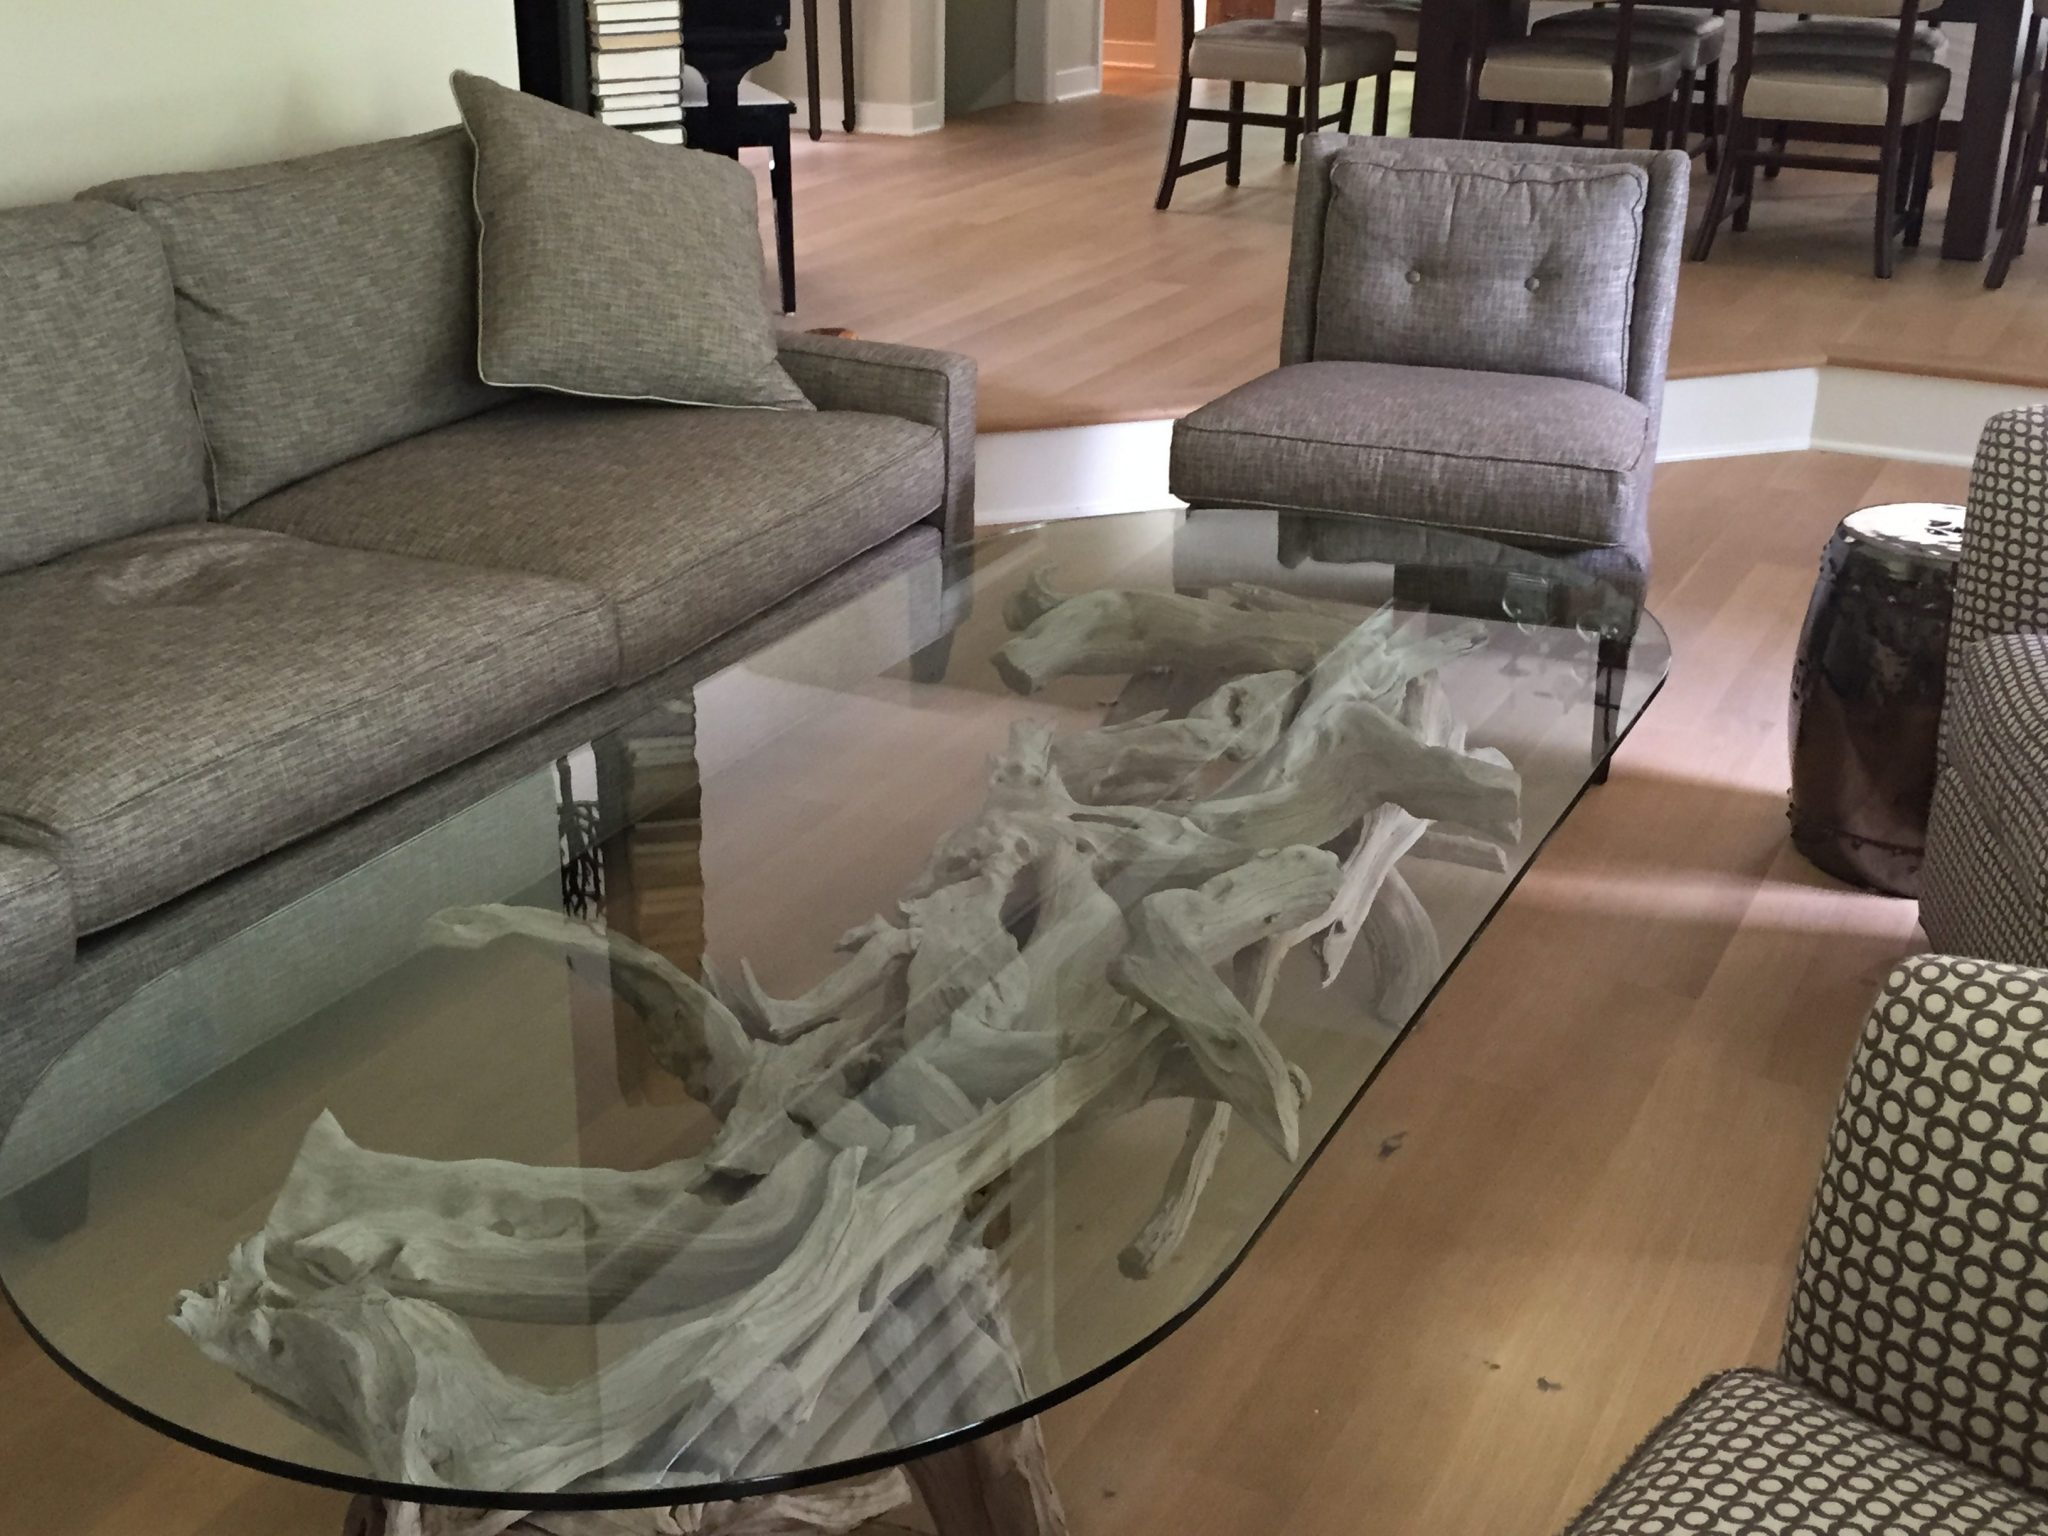 driftwood & glass cfoffee table